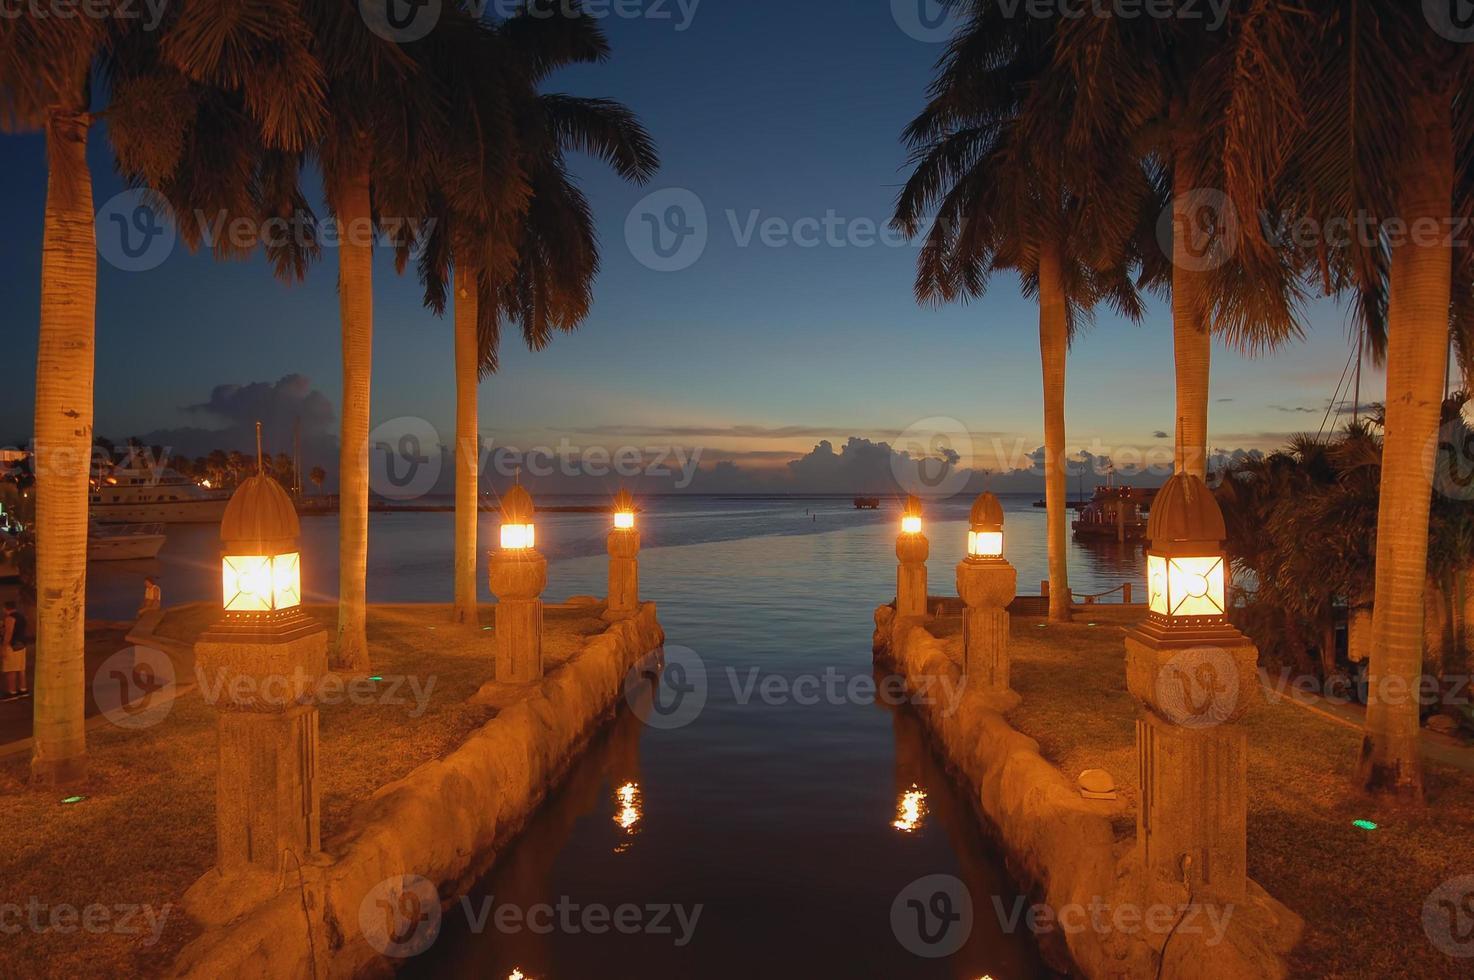 aruba canal night view local romântico. foto